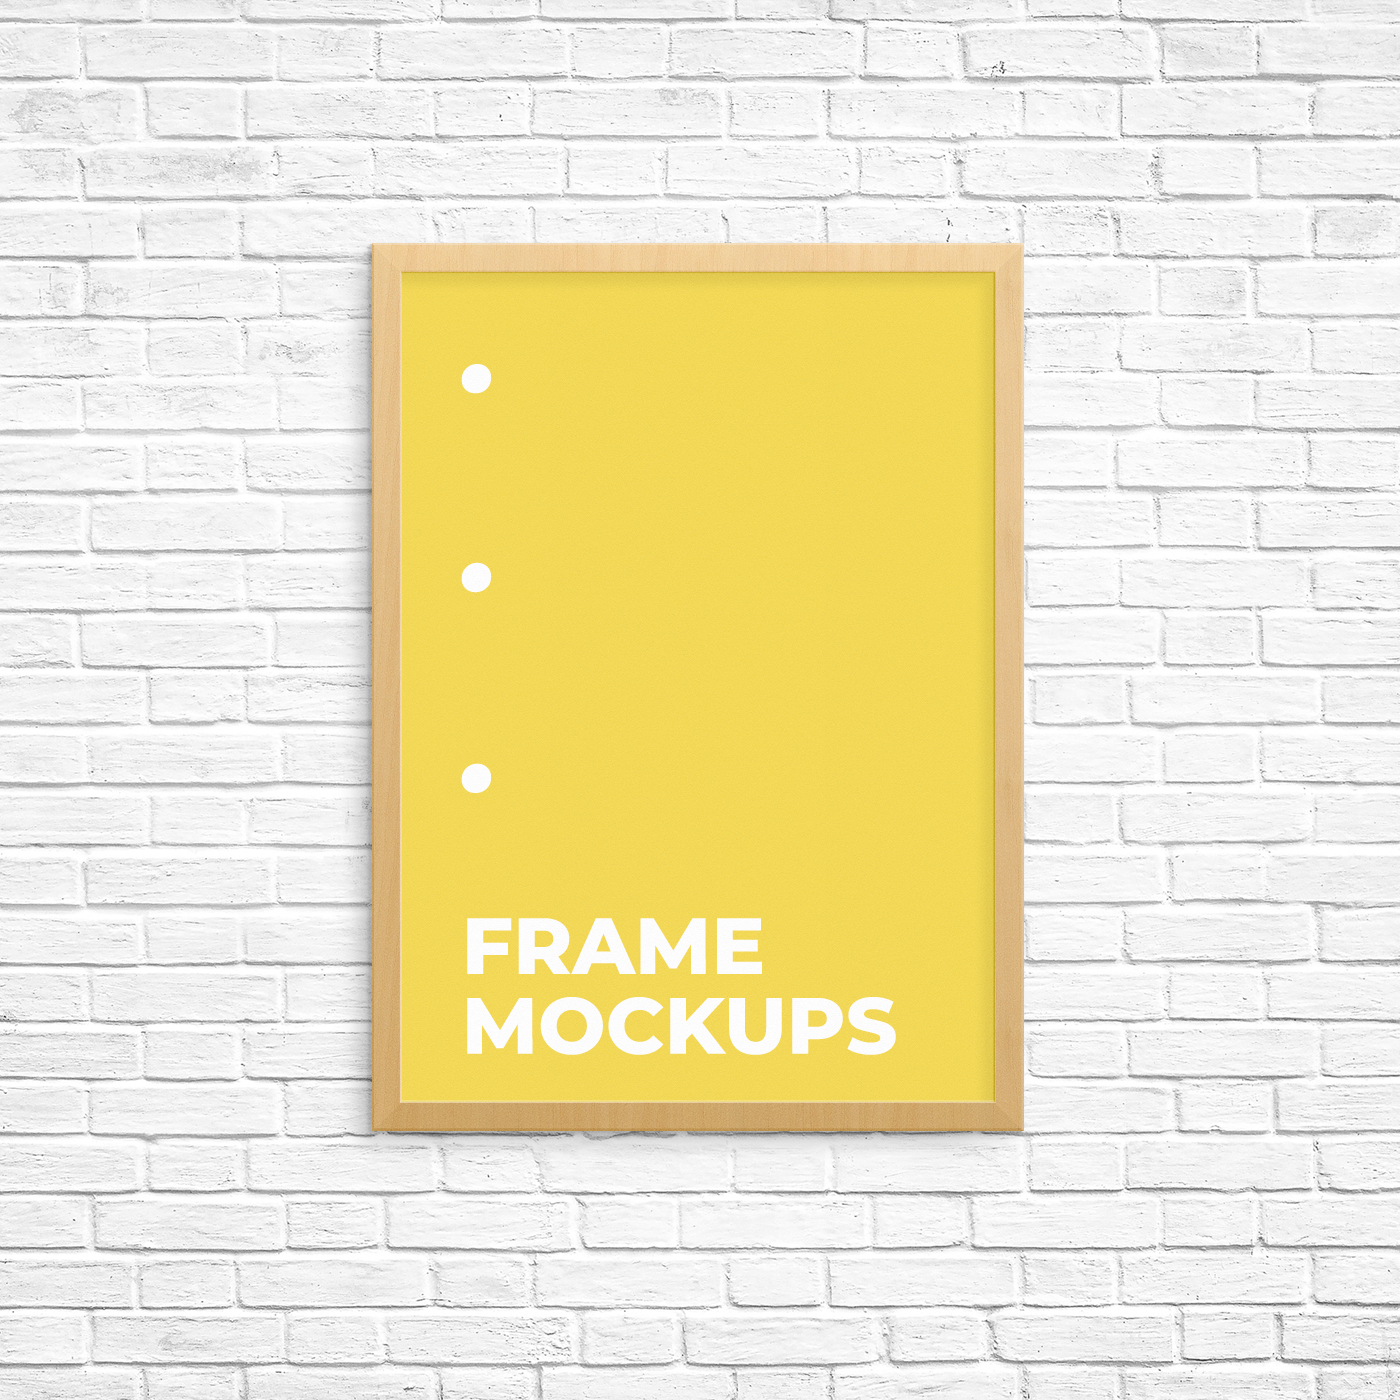 Poster Frame Mockup on a Brick Wall